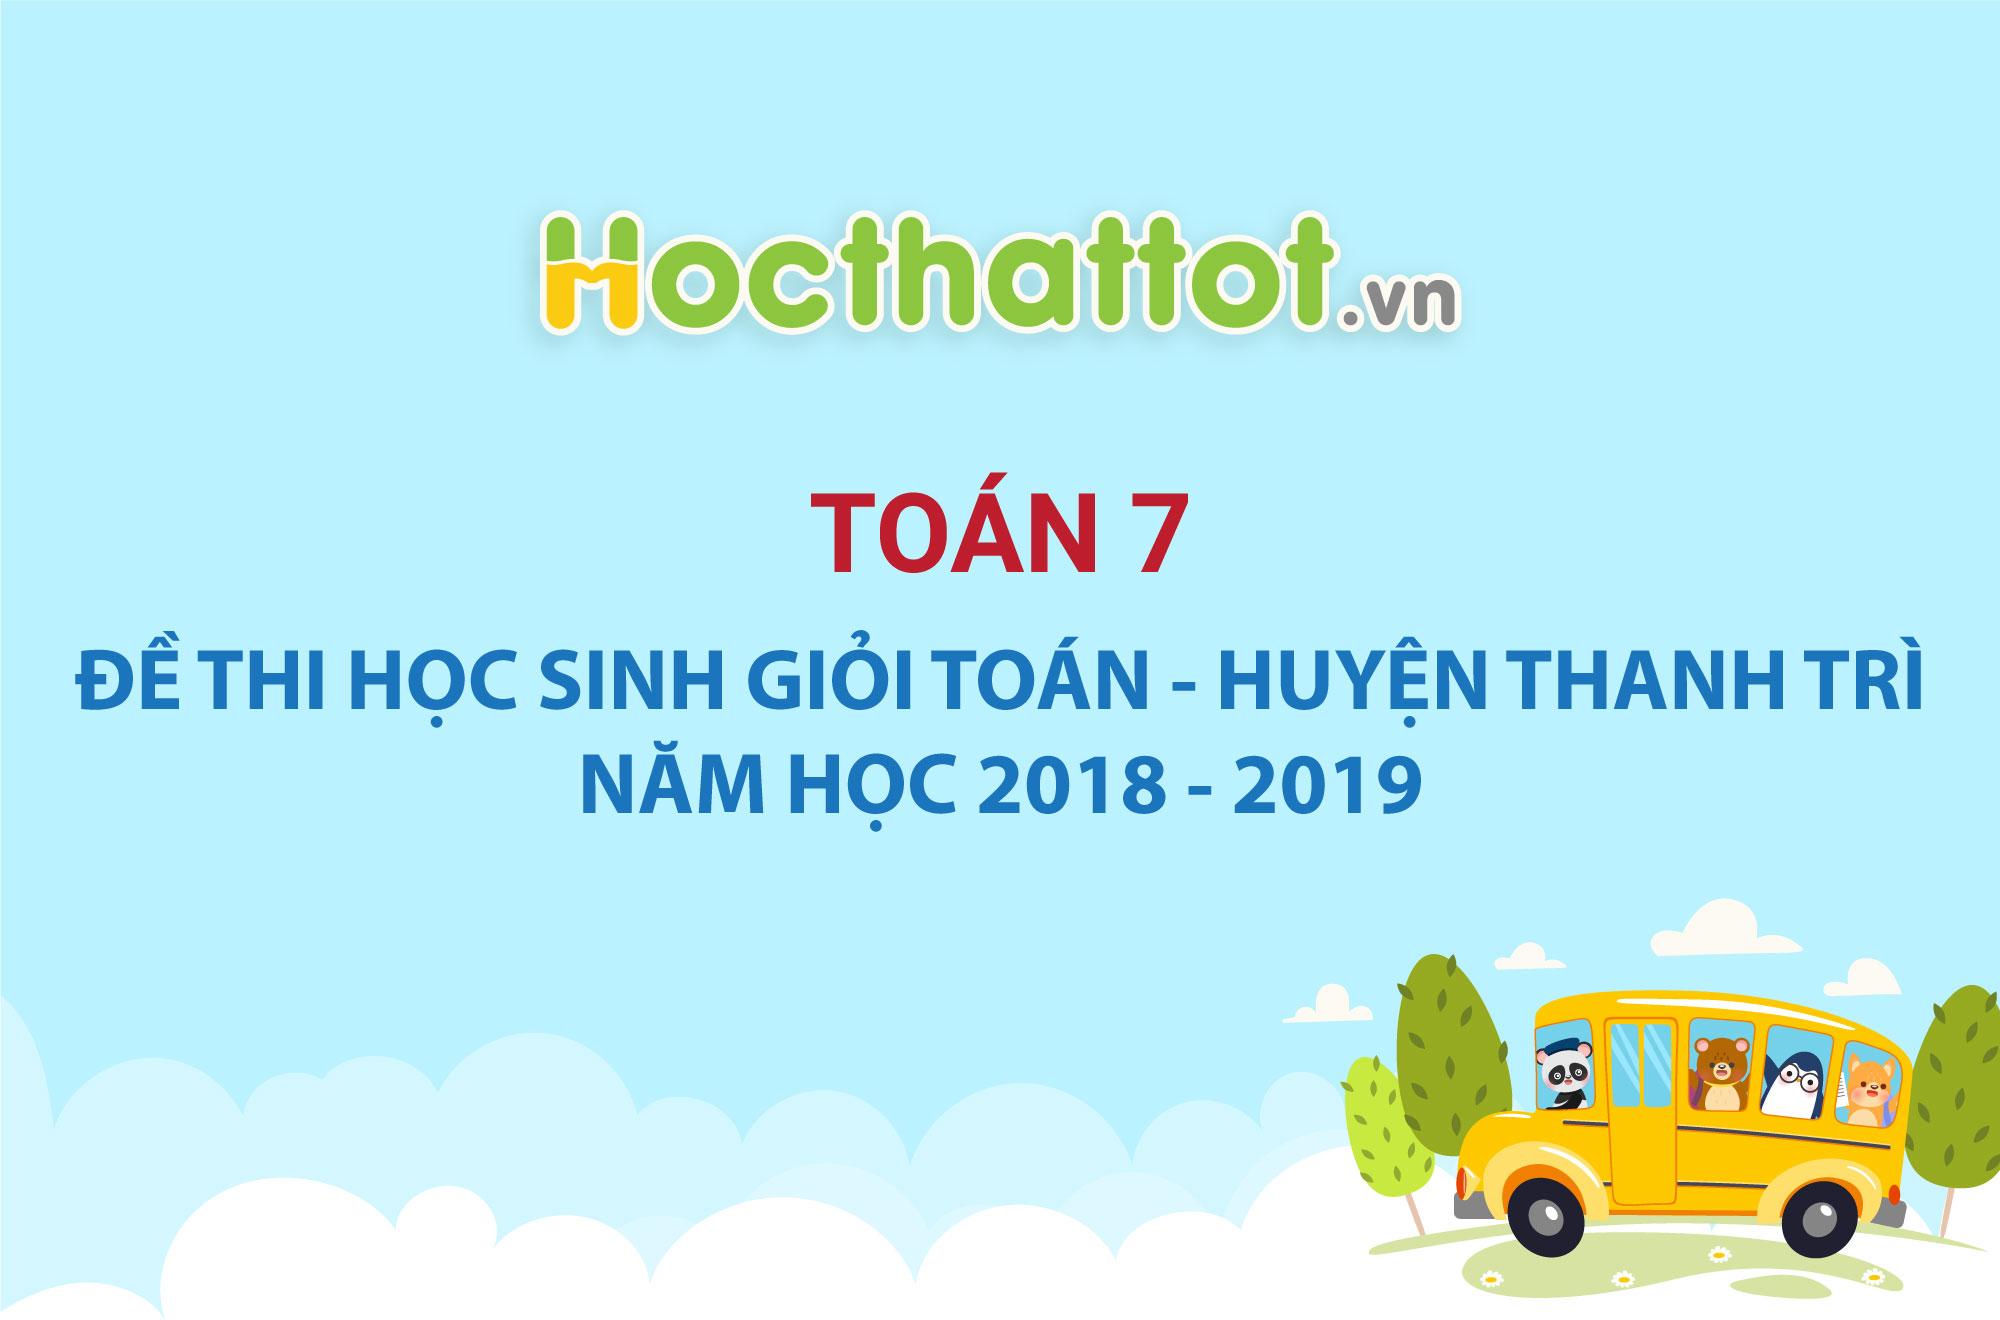 hsg-7-thanhtri-2019